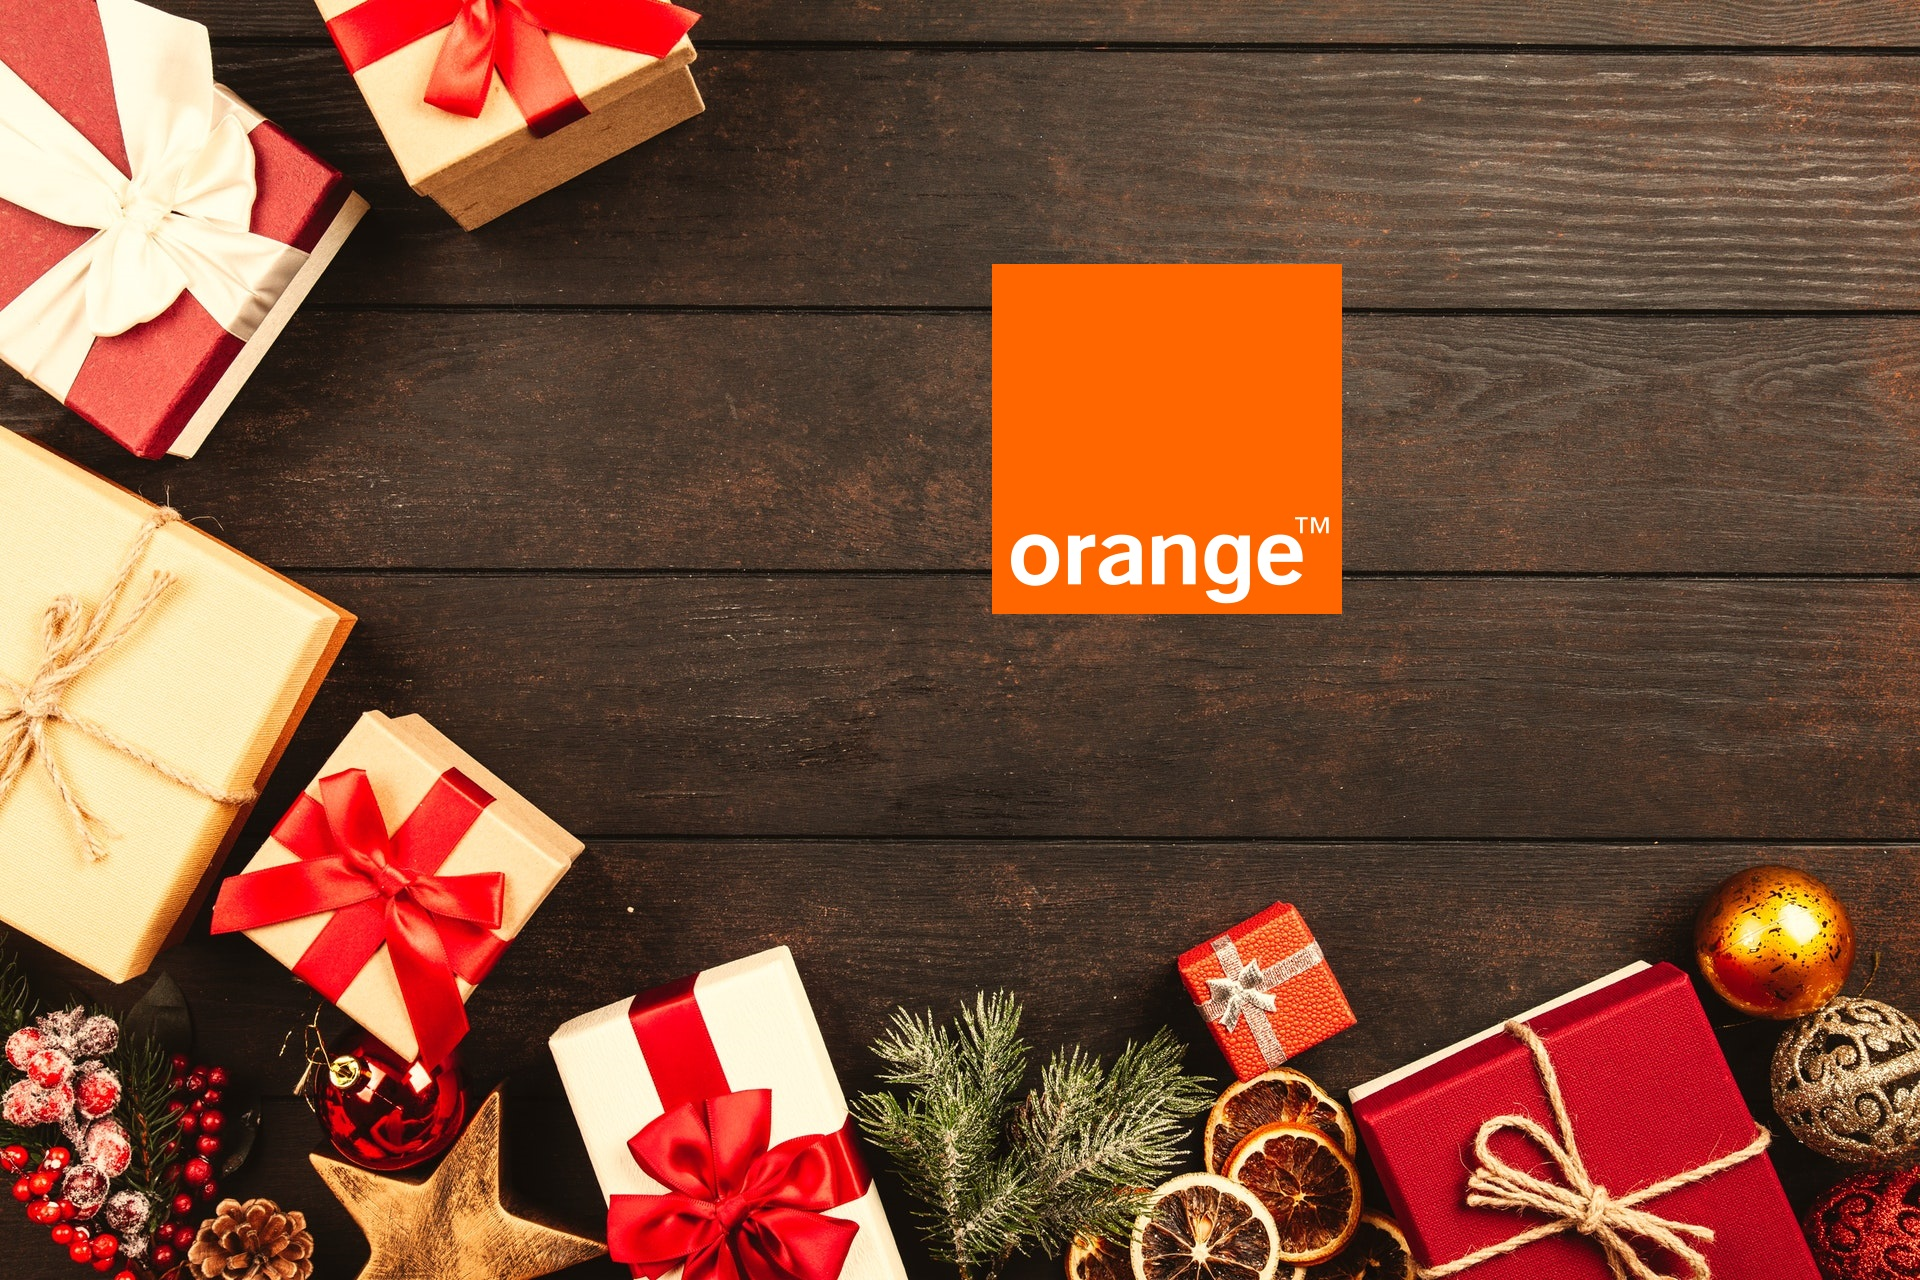 Telewizor i drugi smartfon za złotówkę na święta od Orange 18